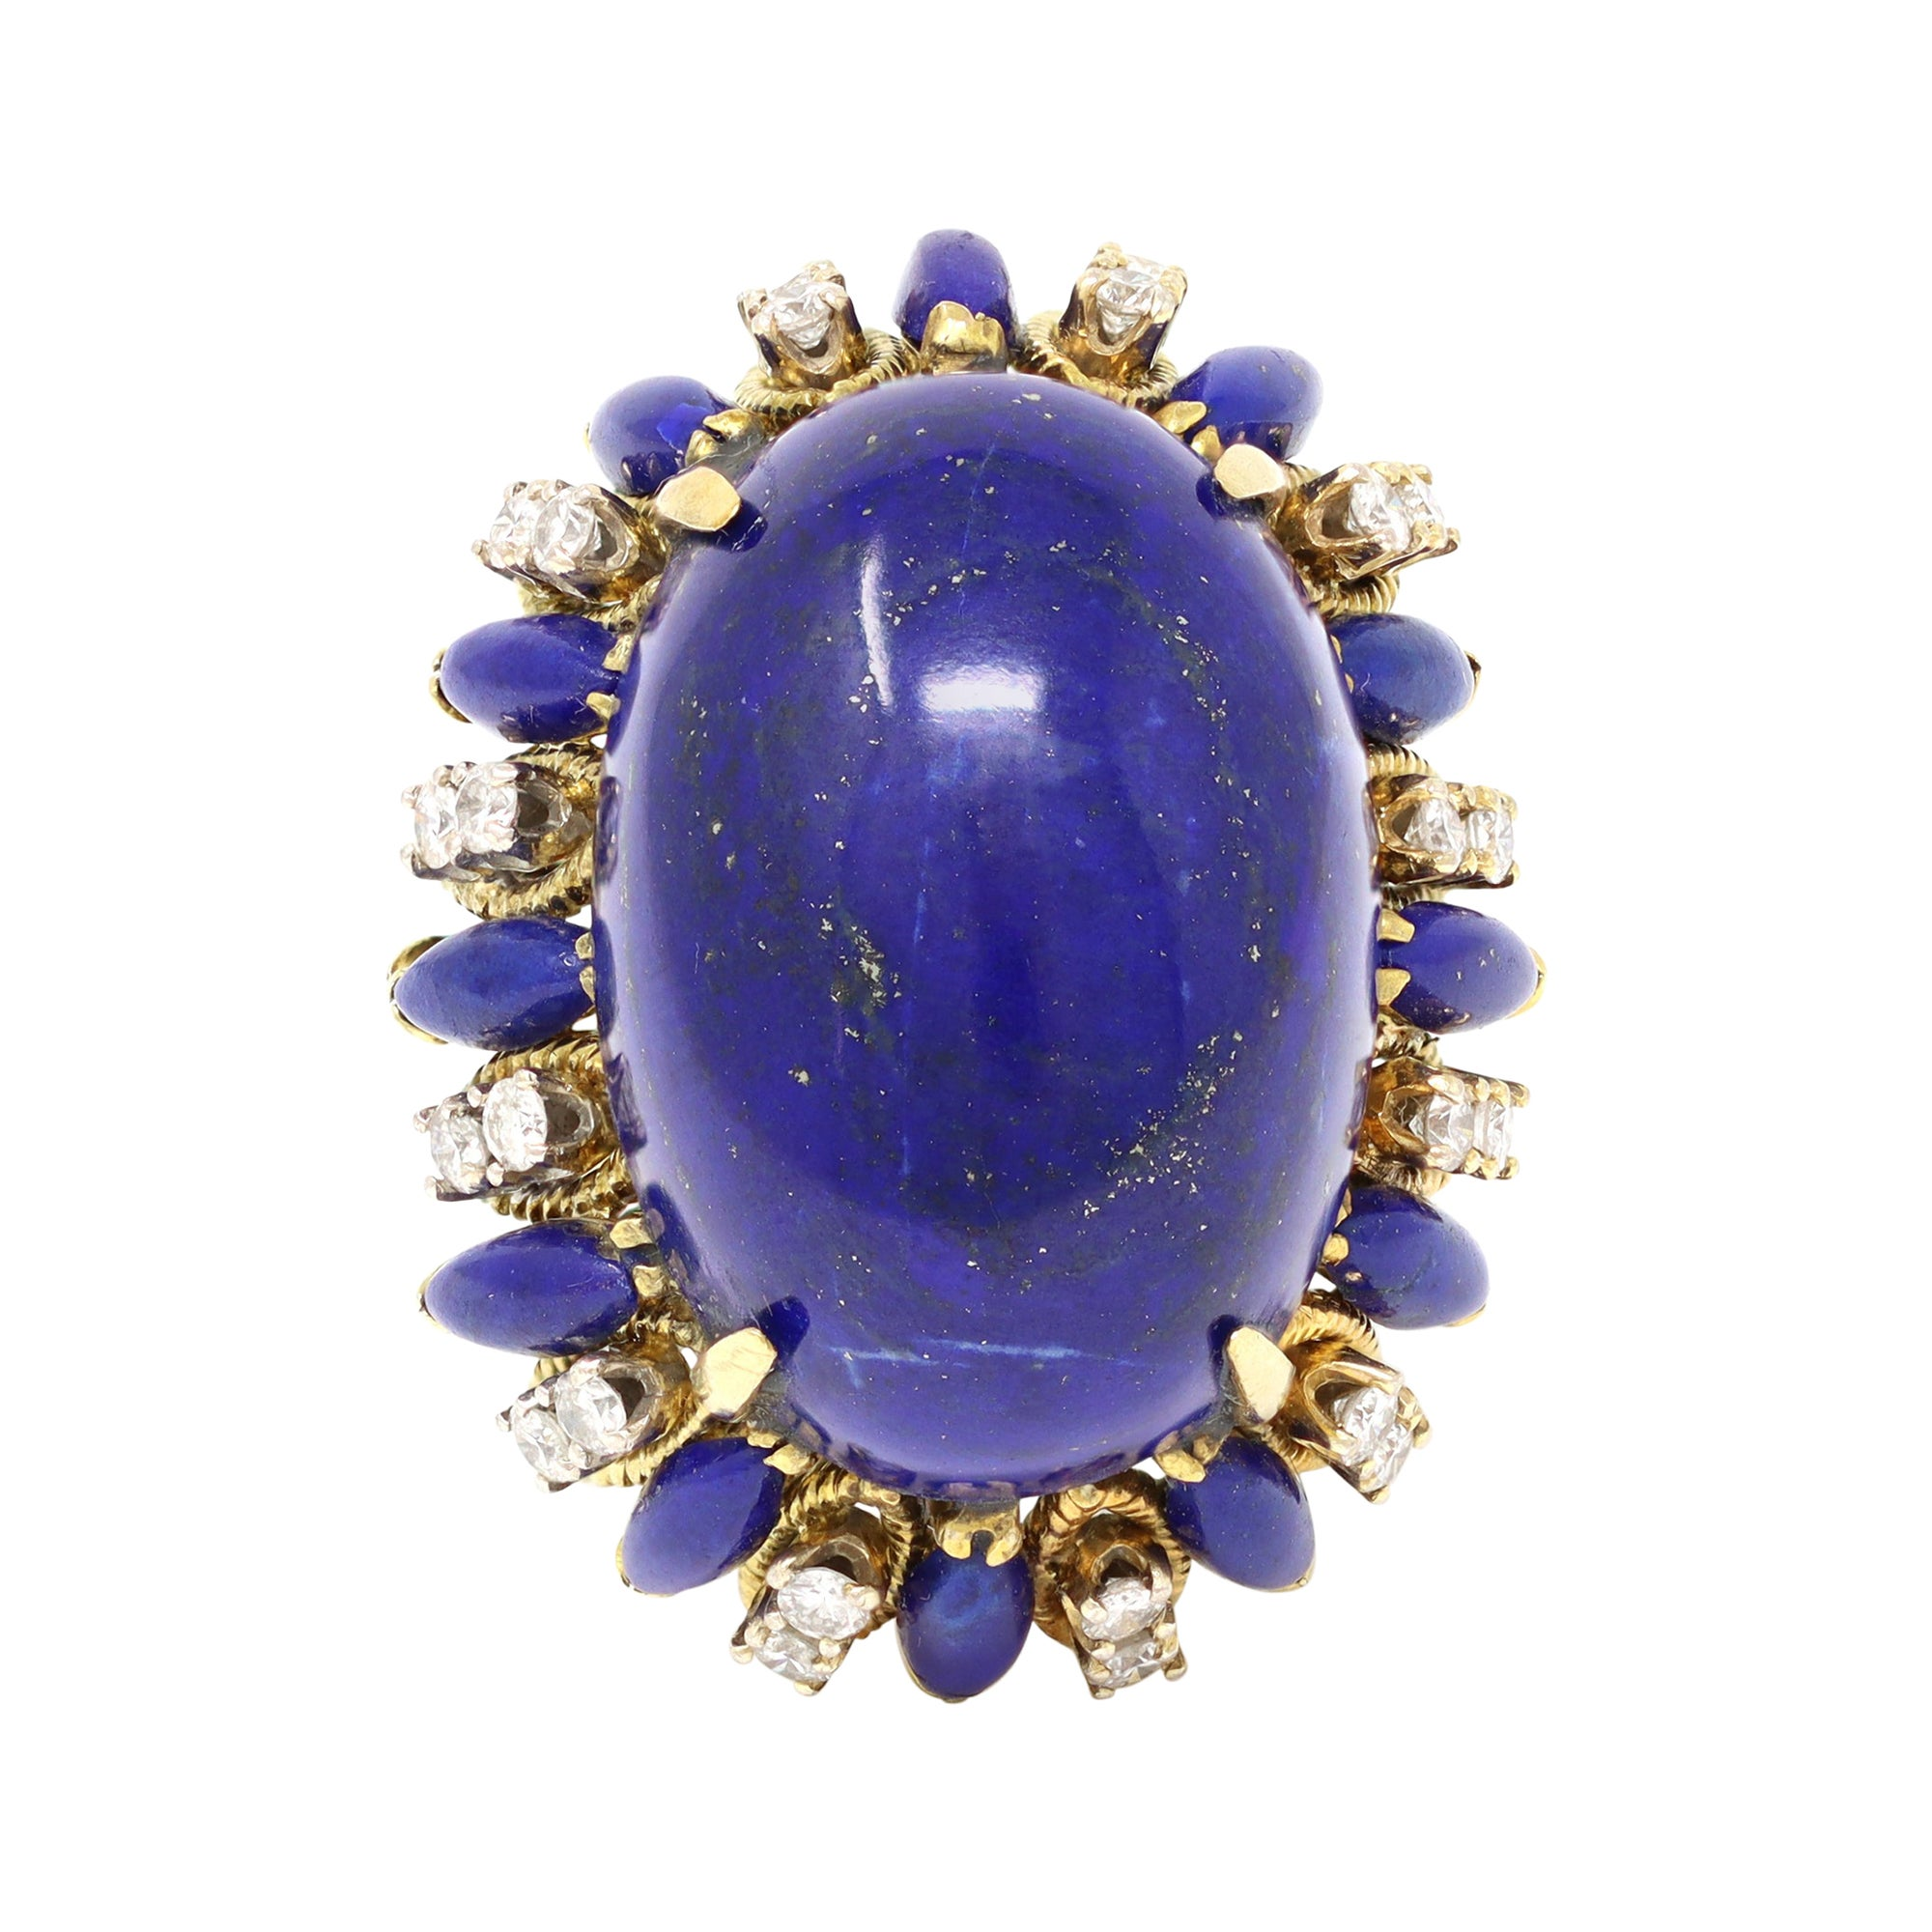 Large Cabochon Lapis Lazuli and Diamond Cocktail Ring, Circa 1970